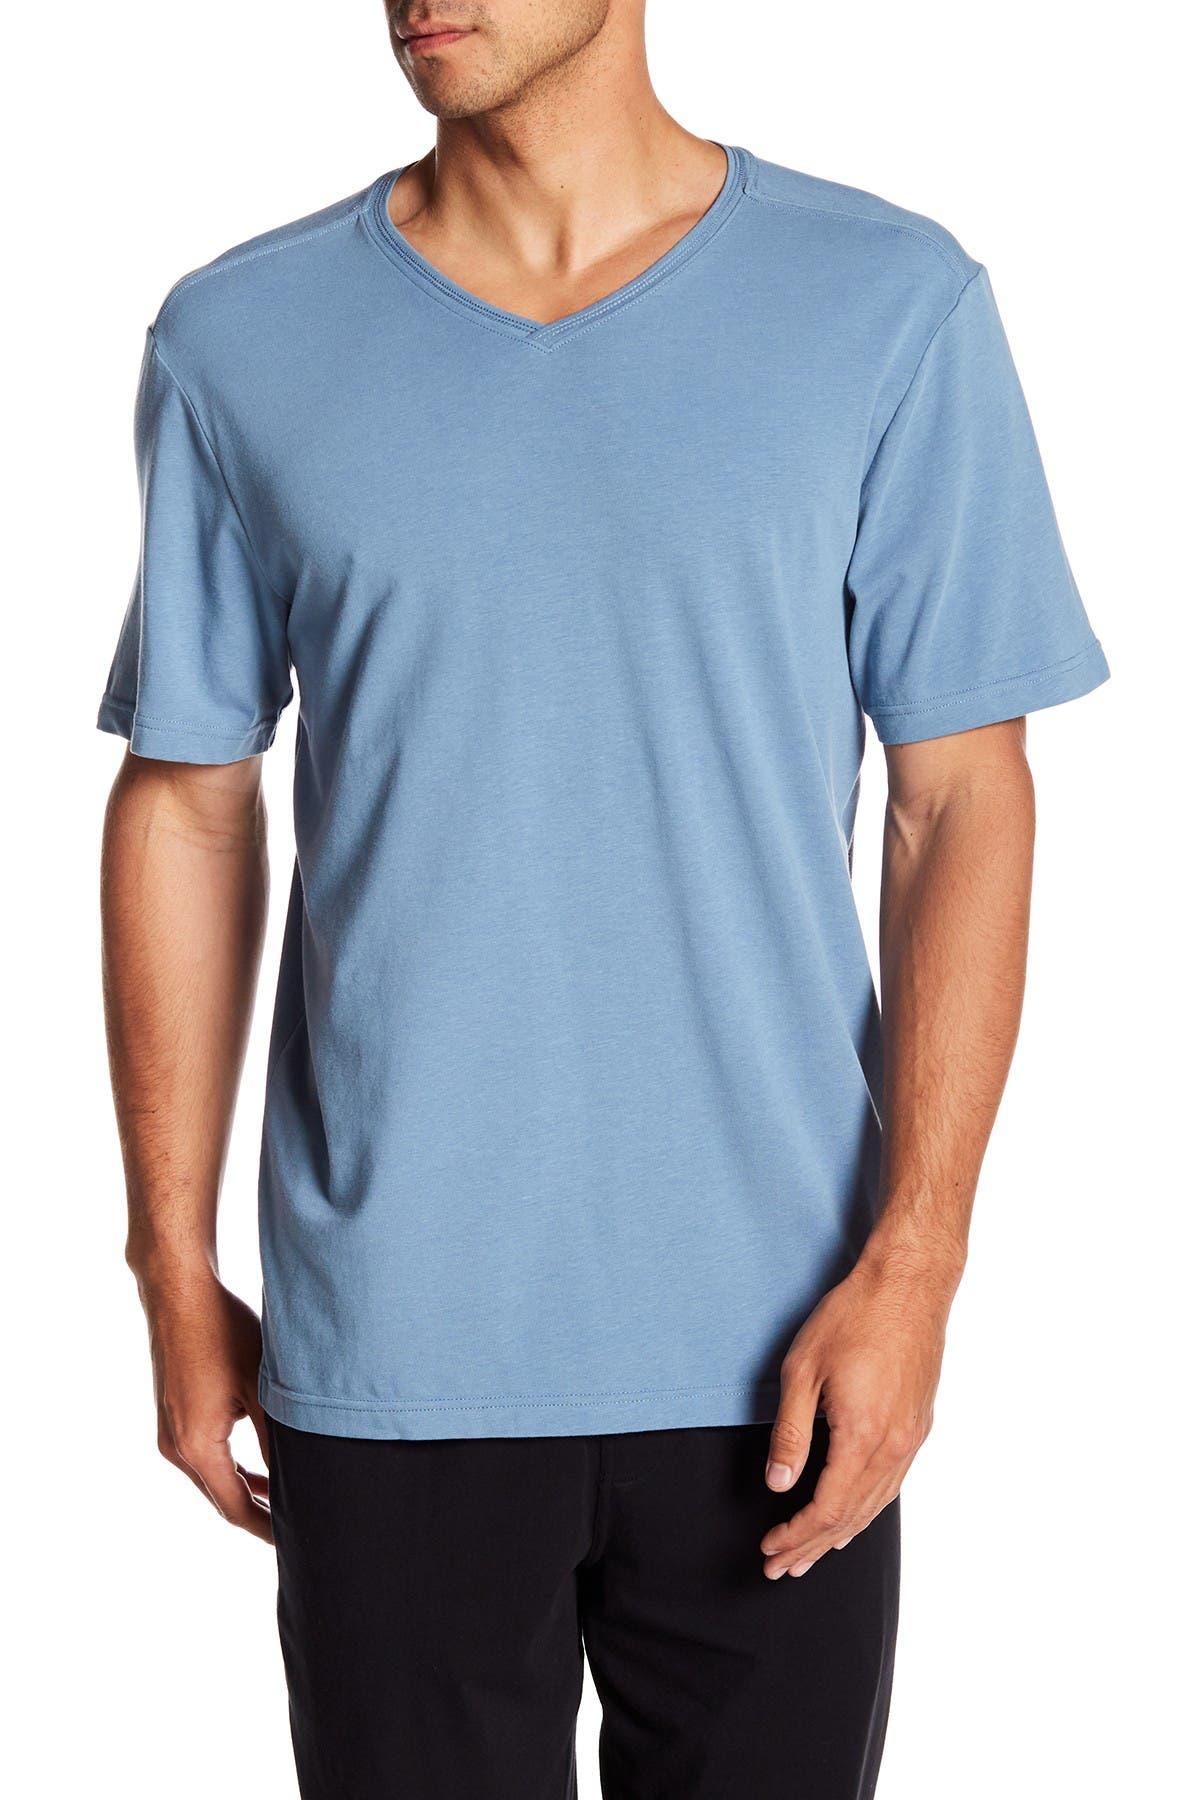 Image of Joe's Jeans Marine Layer V-Neck Lounge T-Shirt